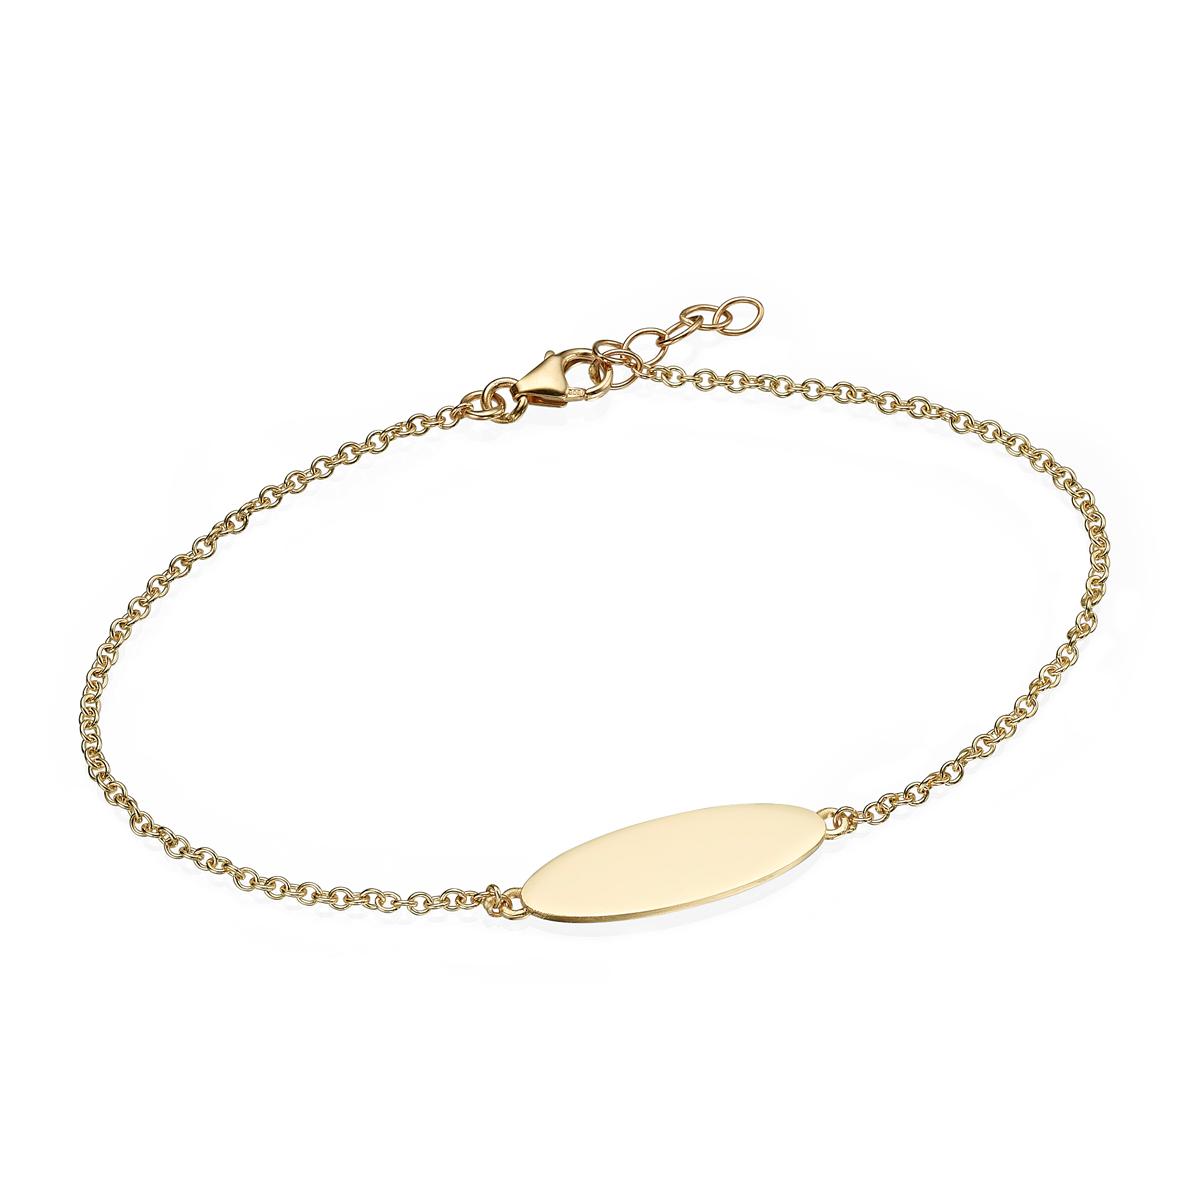 Personalized Oval Gold Bar Engraved Bracelet